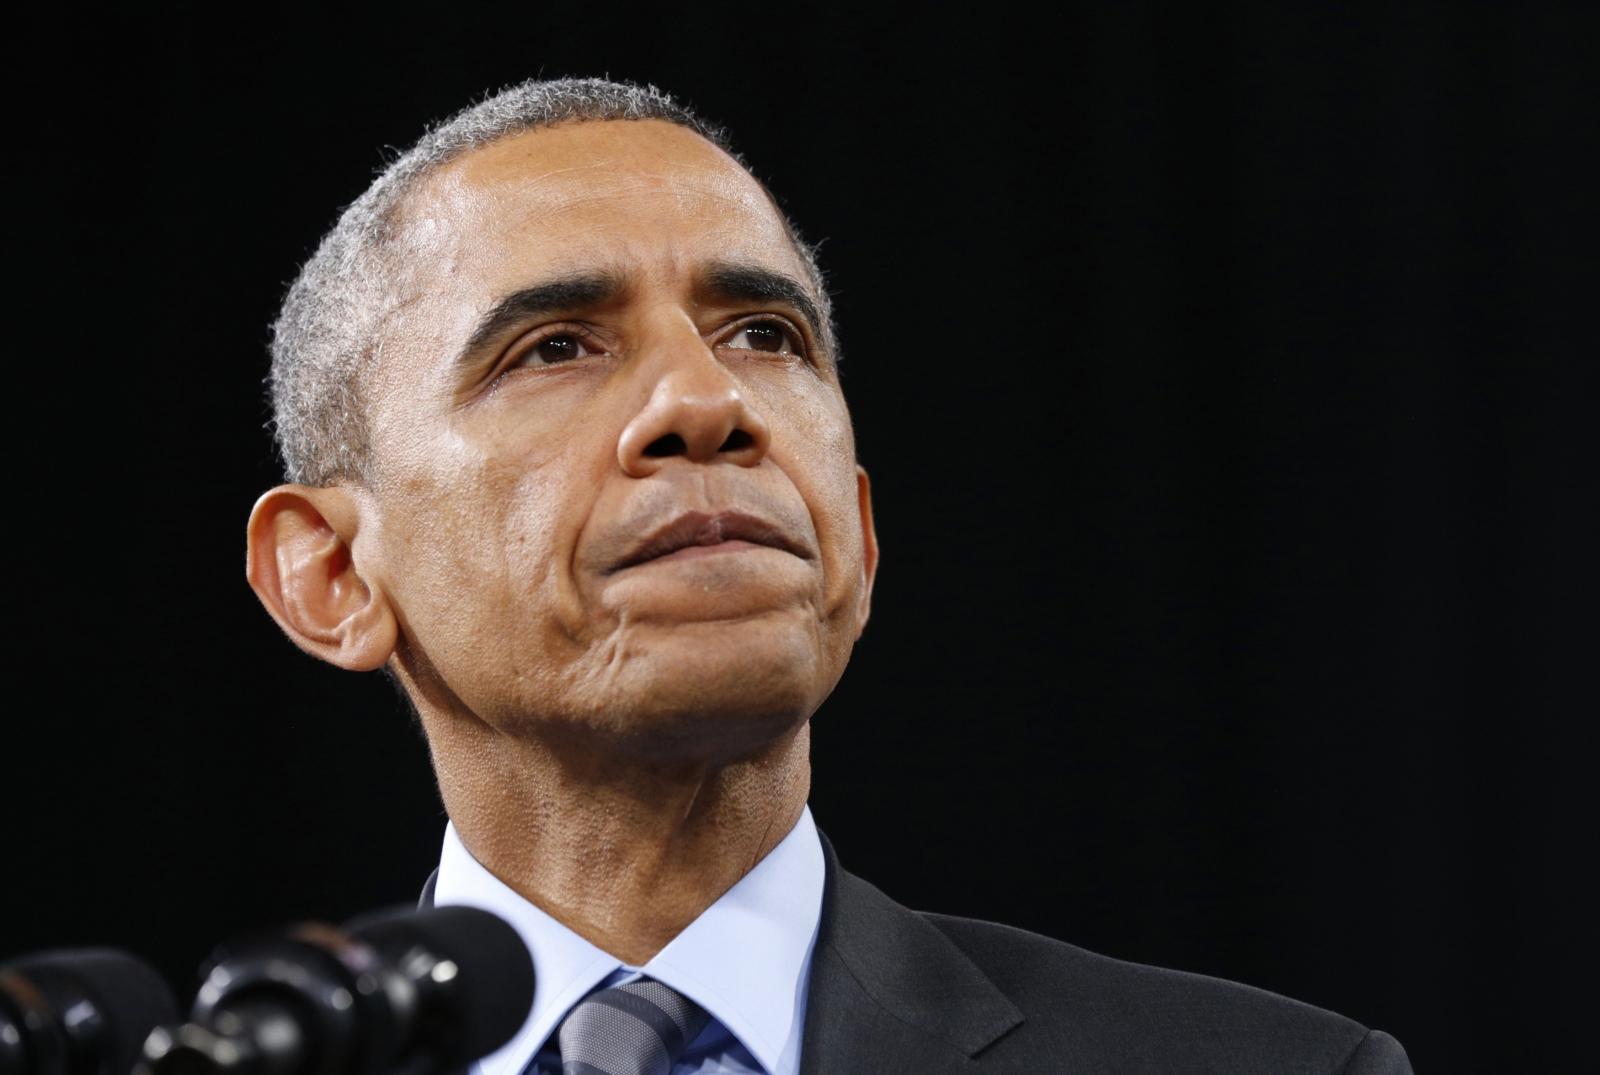 Obama's immigration reforms